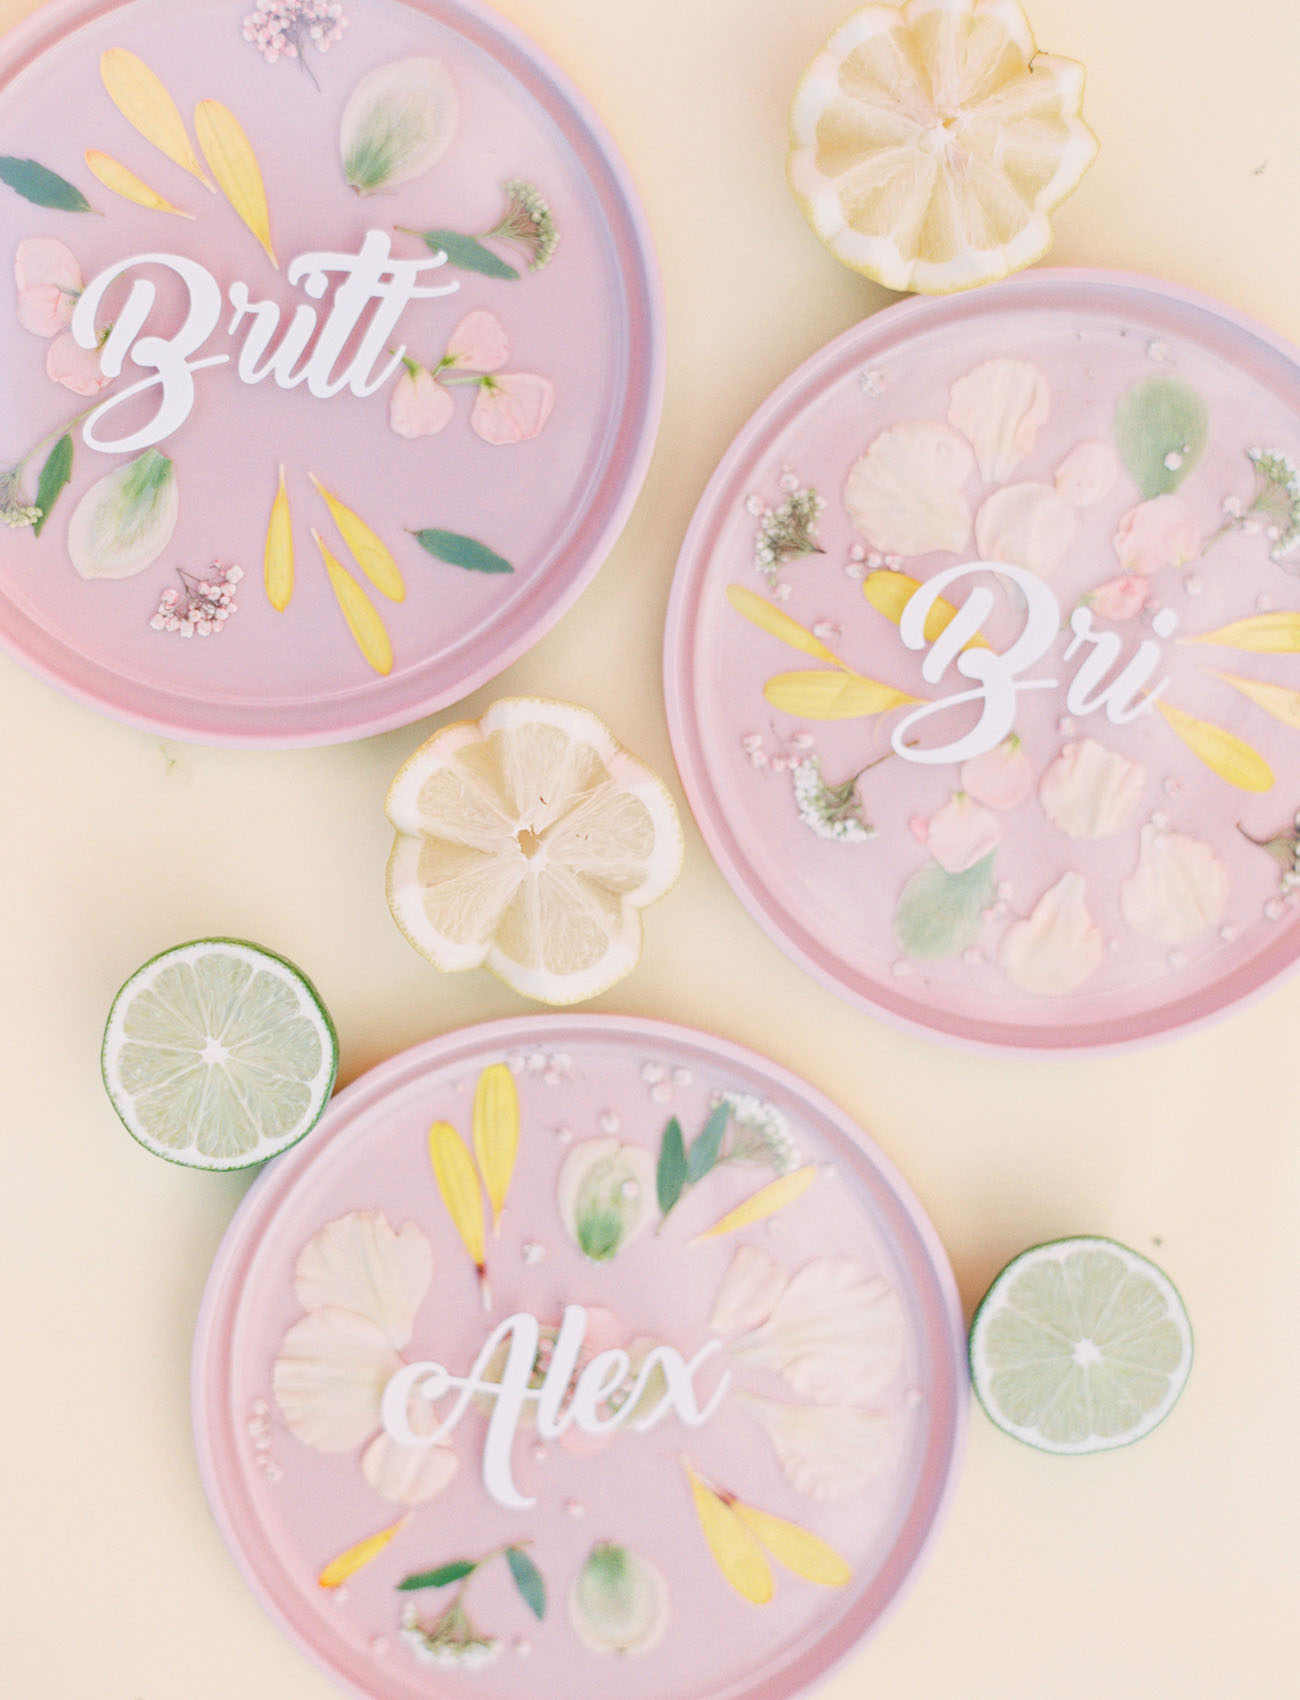 acrylic pressed flowers